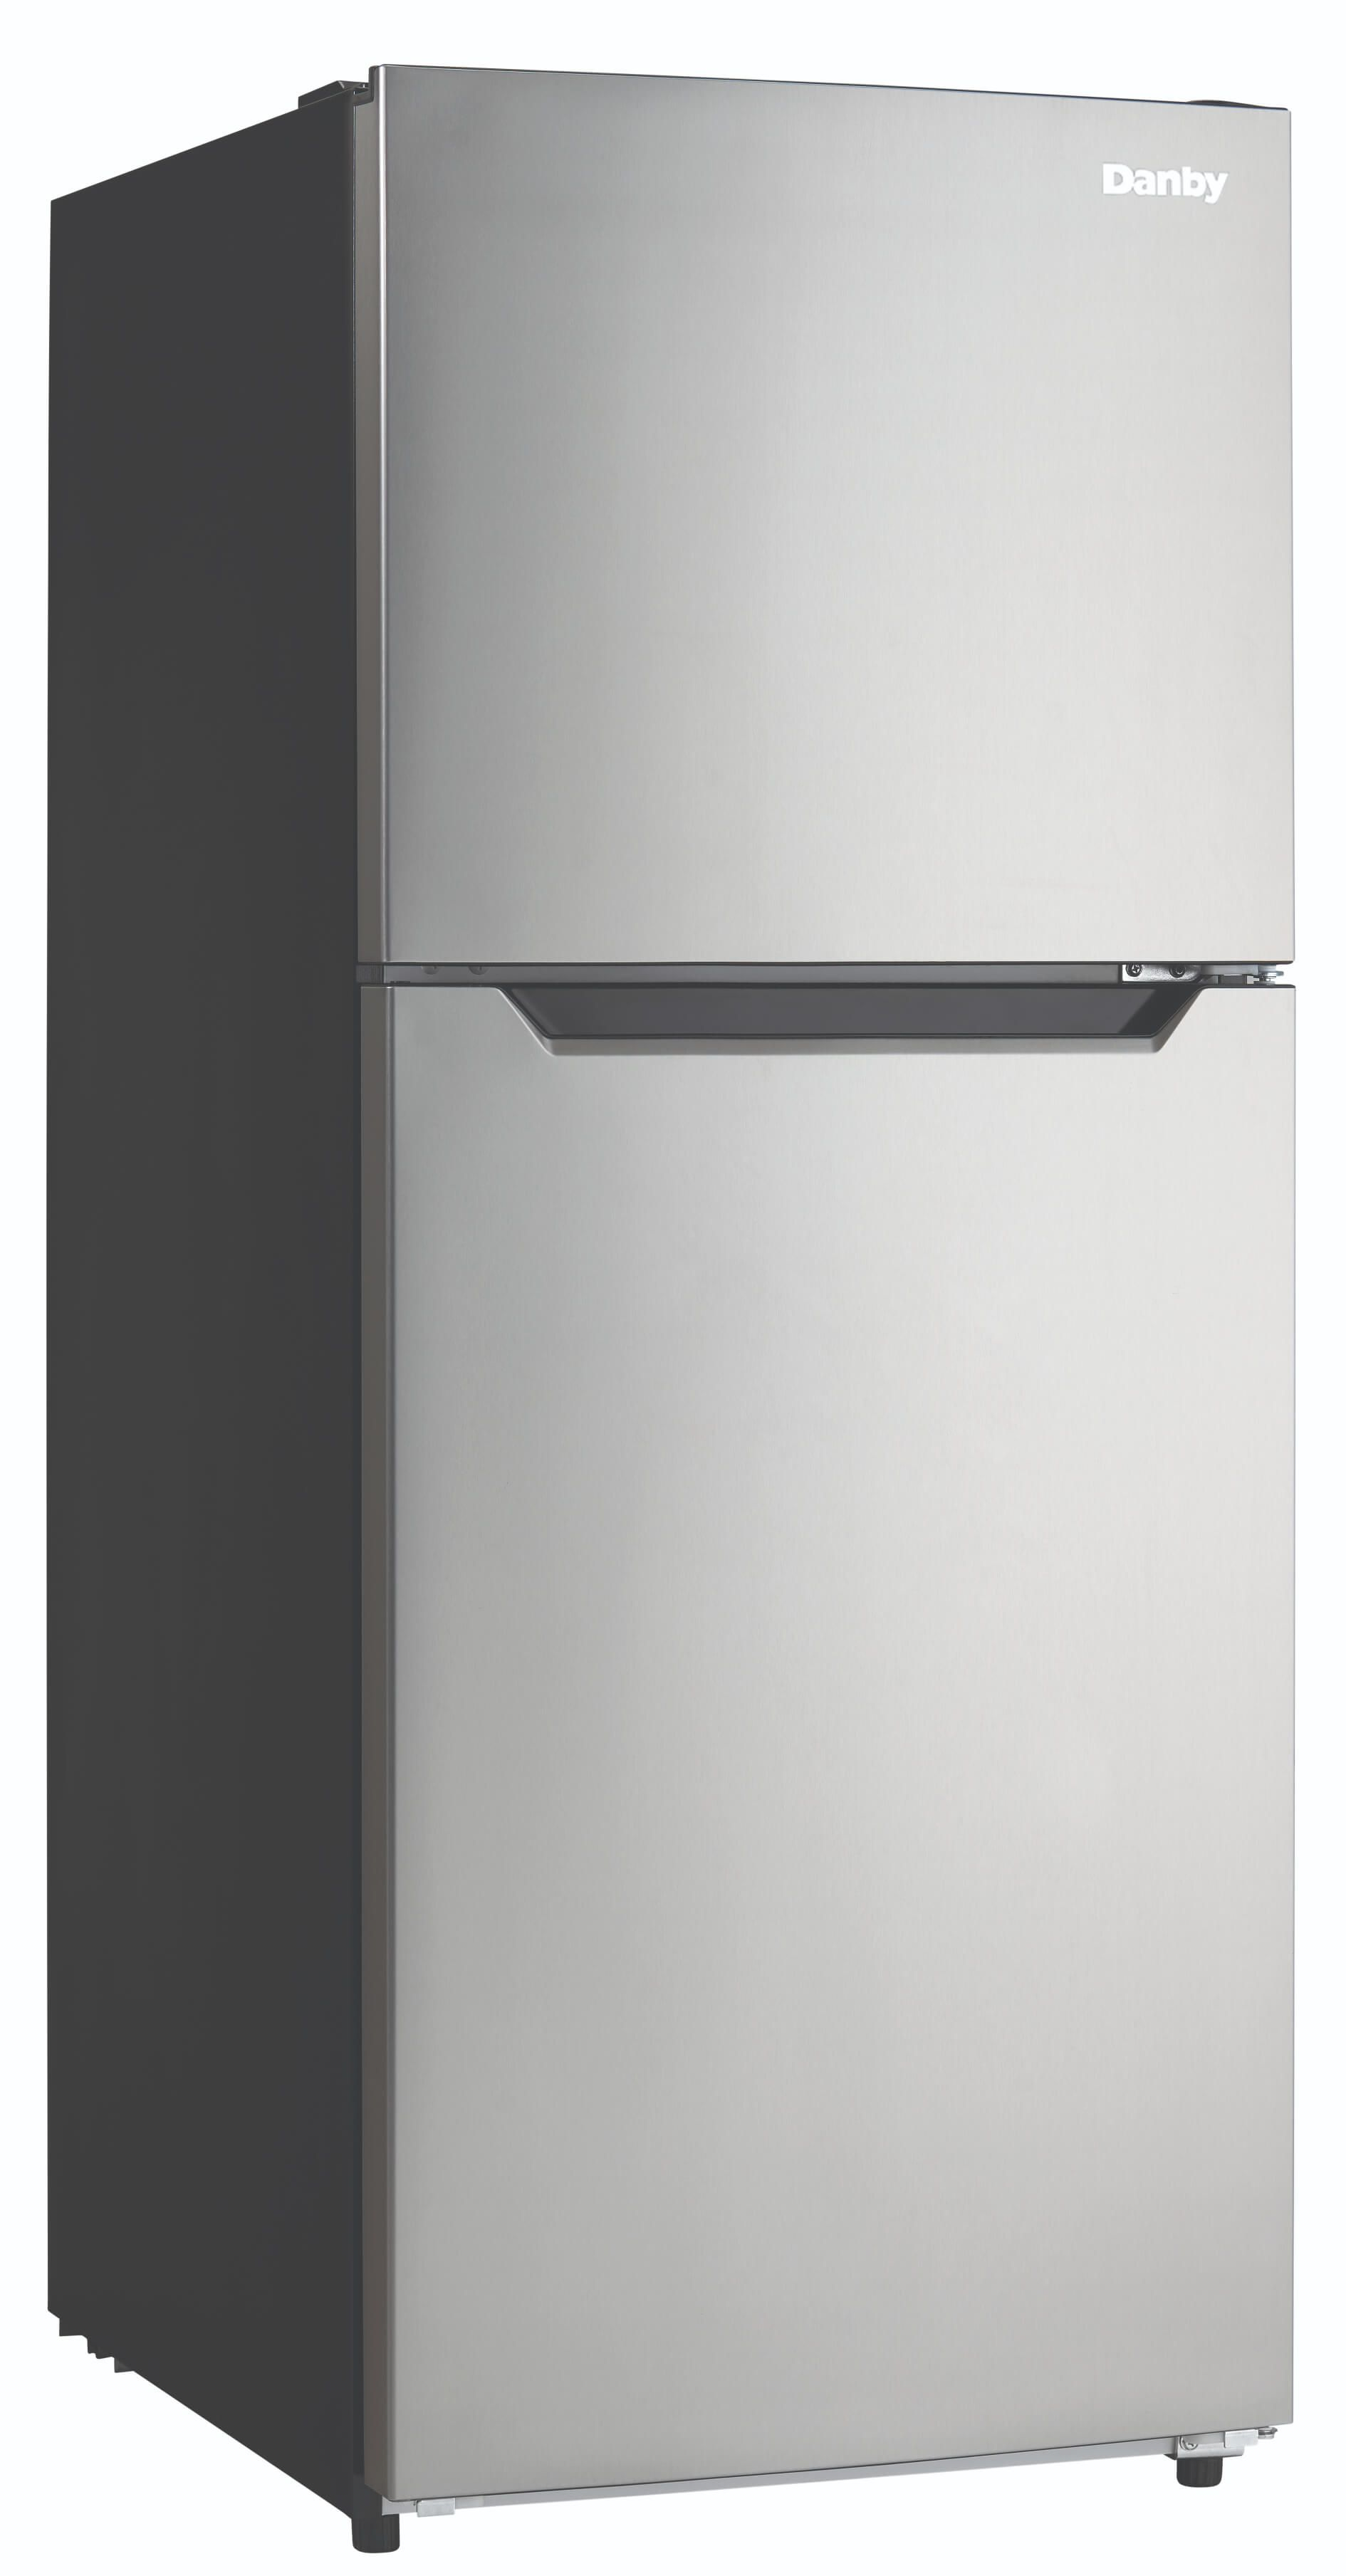 danby-counter-depth-refrigerator-top-freezer